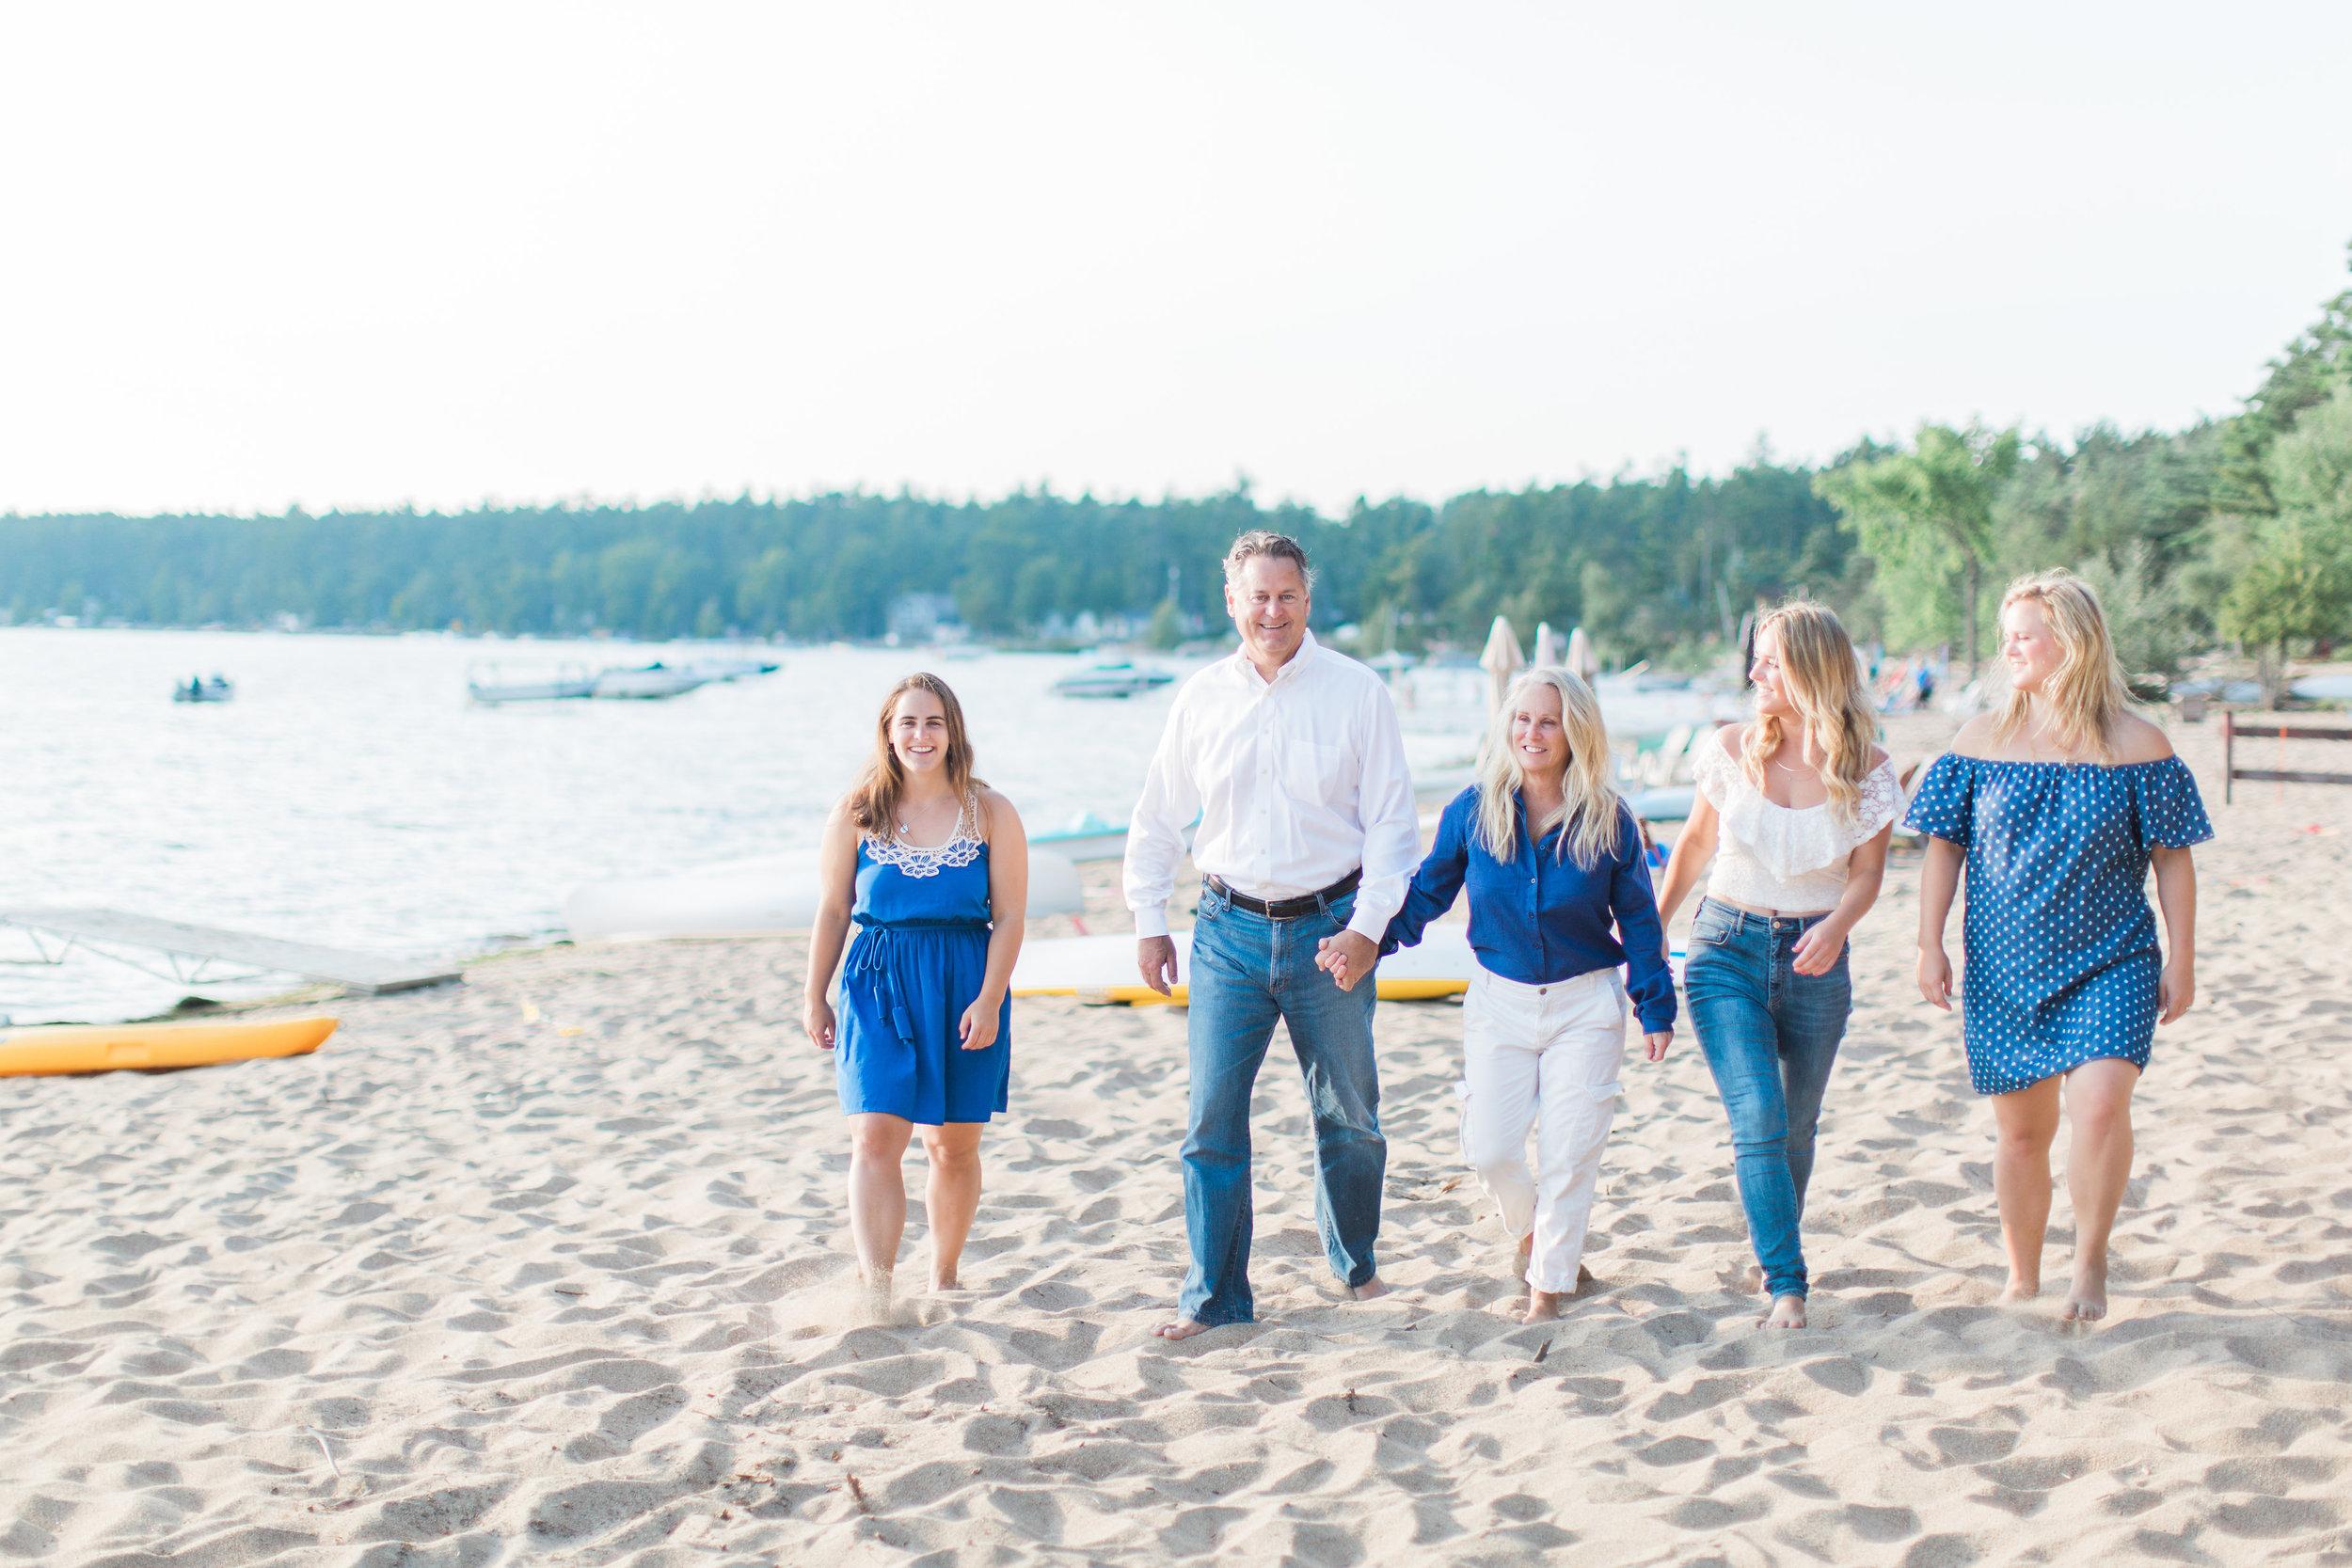 Johnson Family Photos - Louise Johnson